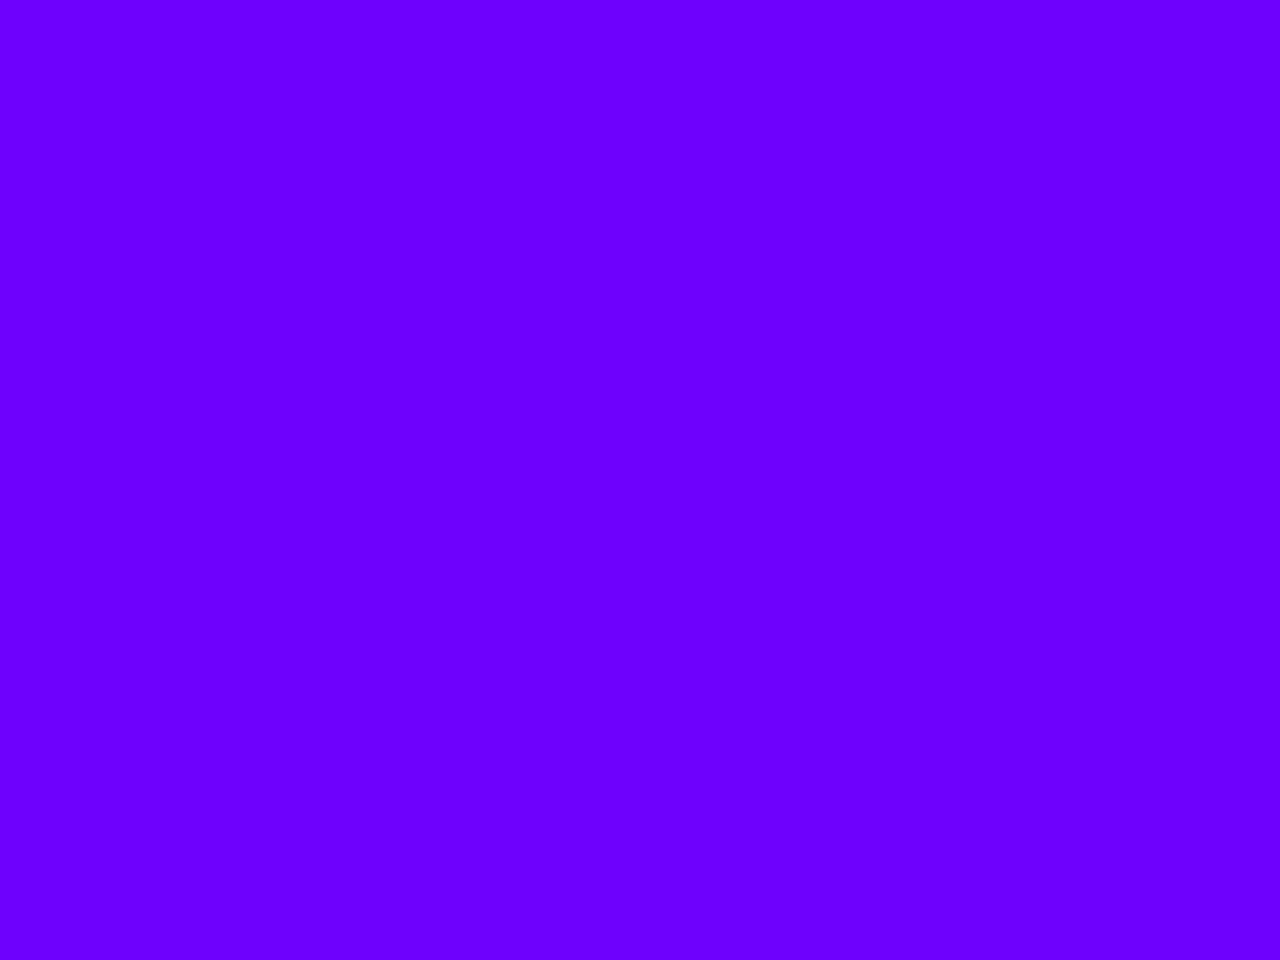 1280x960 Electric Indigo Solid Color Background